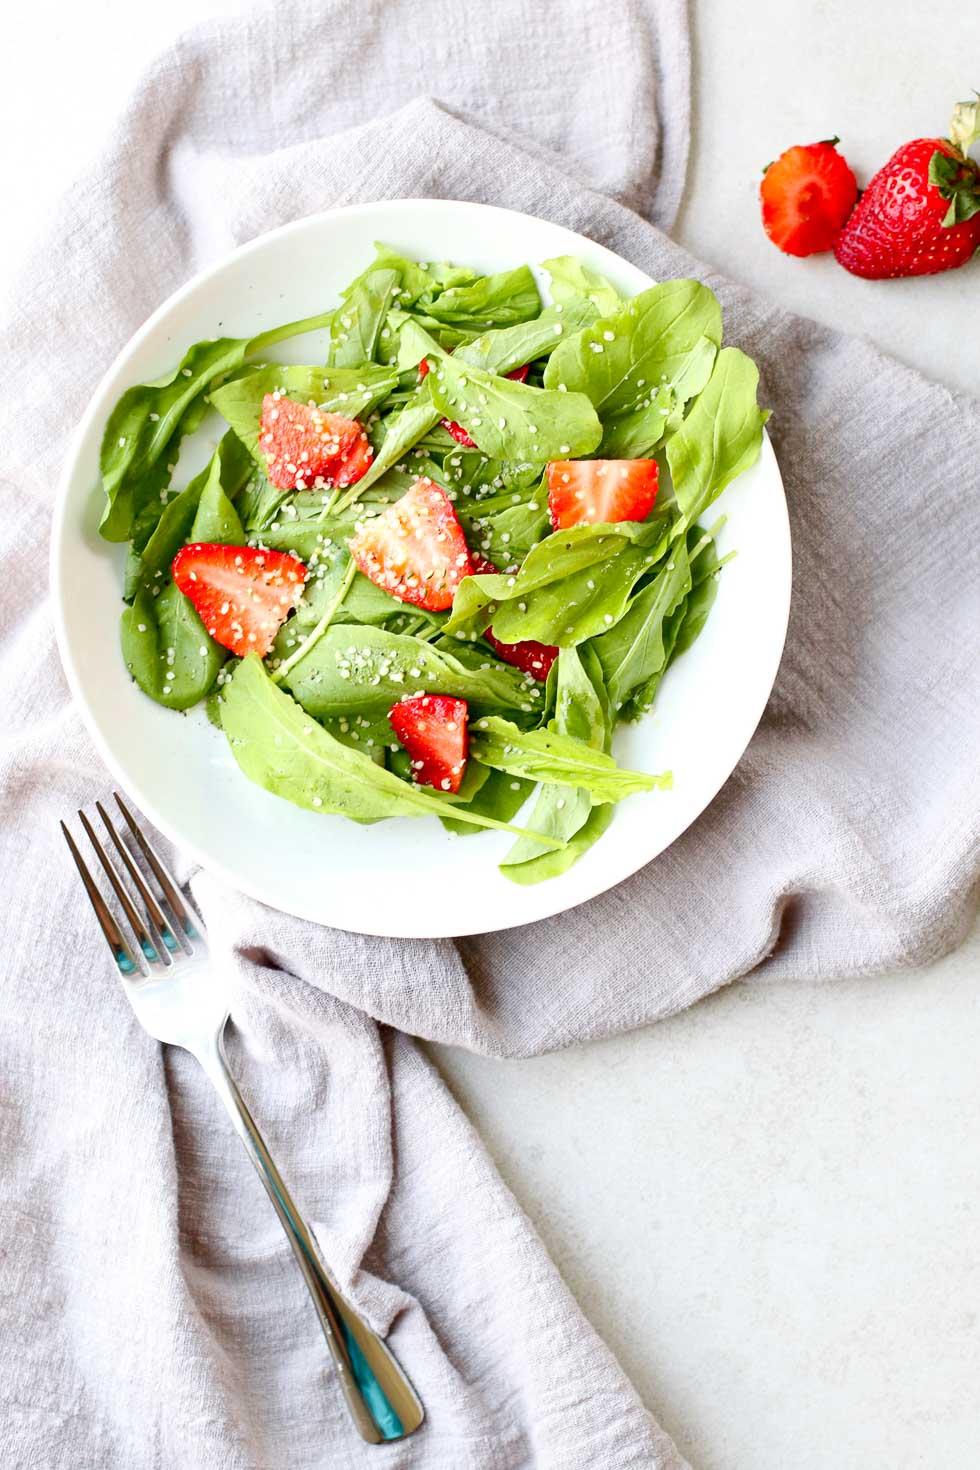 Strawberry Arugula Salad with Hemp Seed with fork